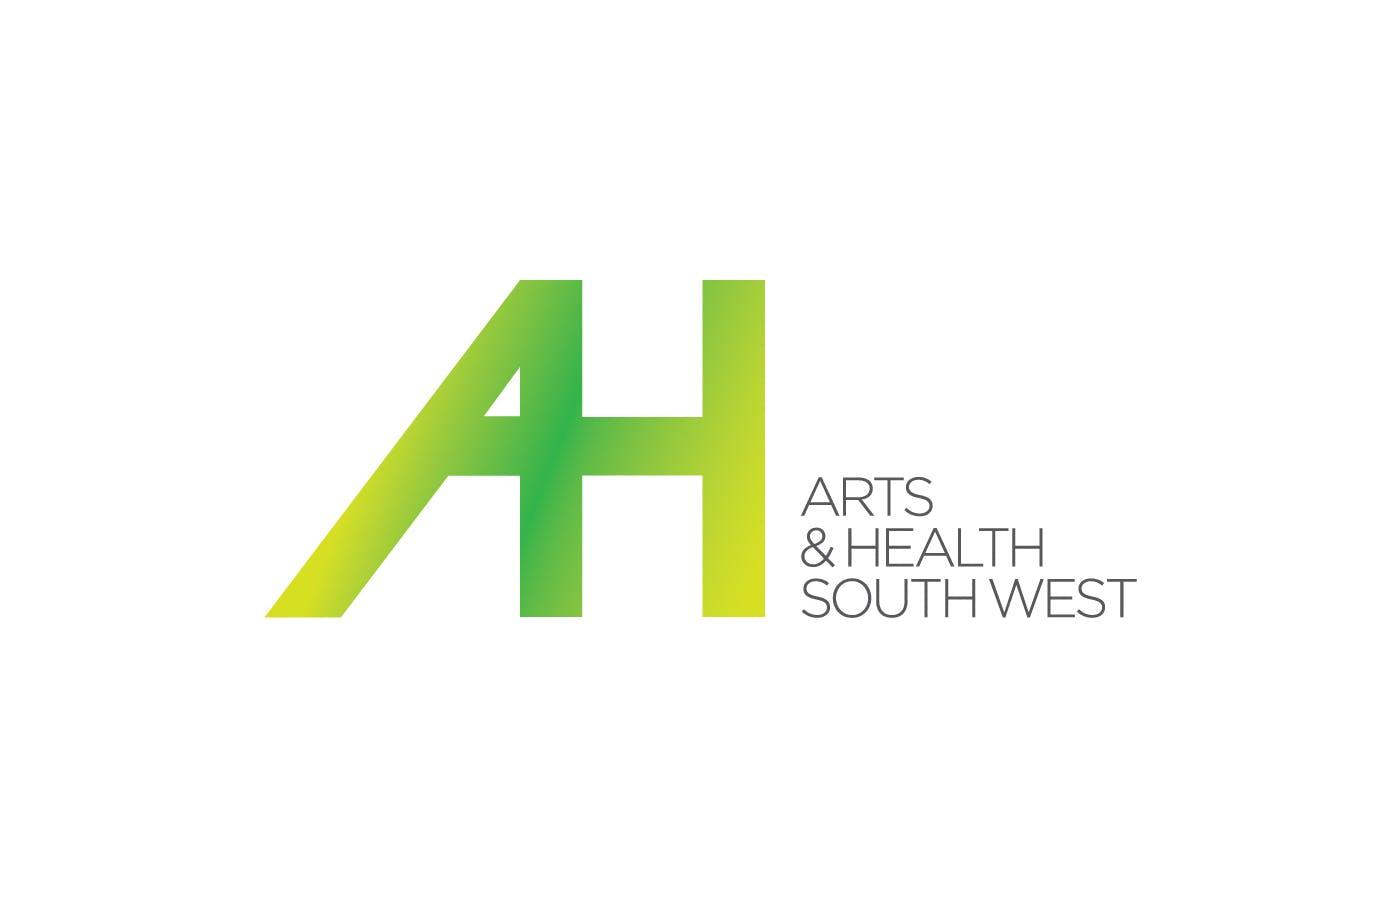 BOTH DAYS - Arts & Health South West Annual C